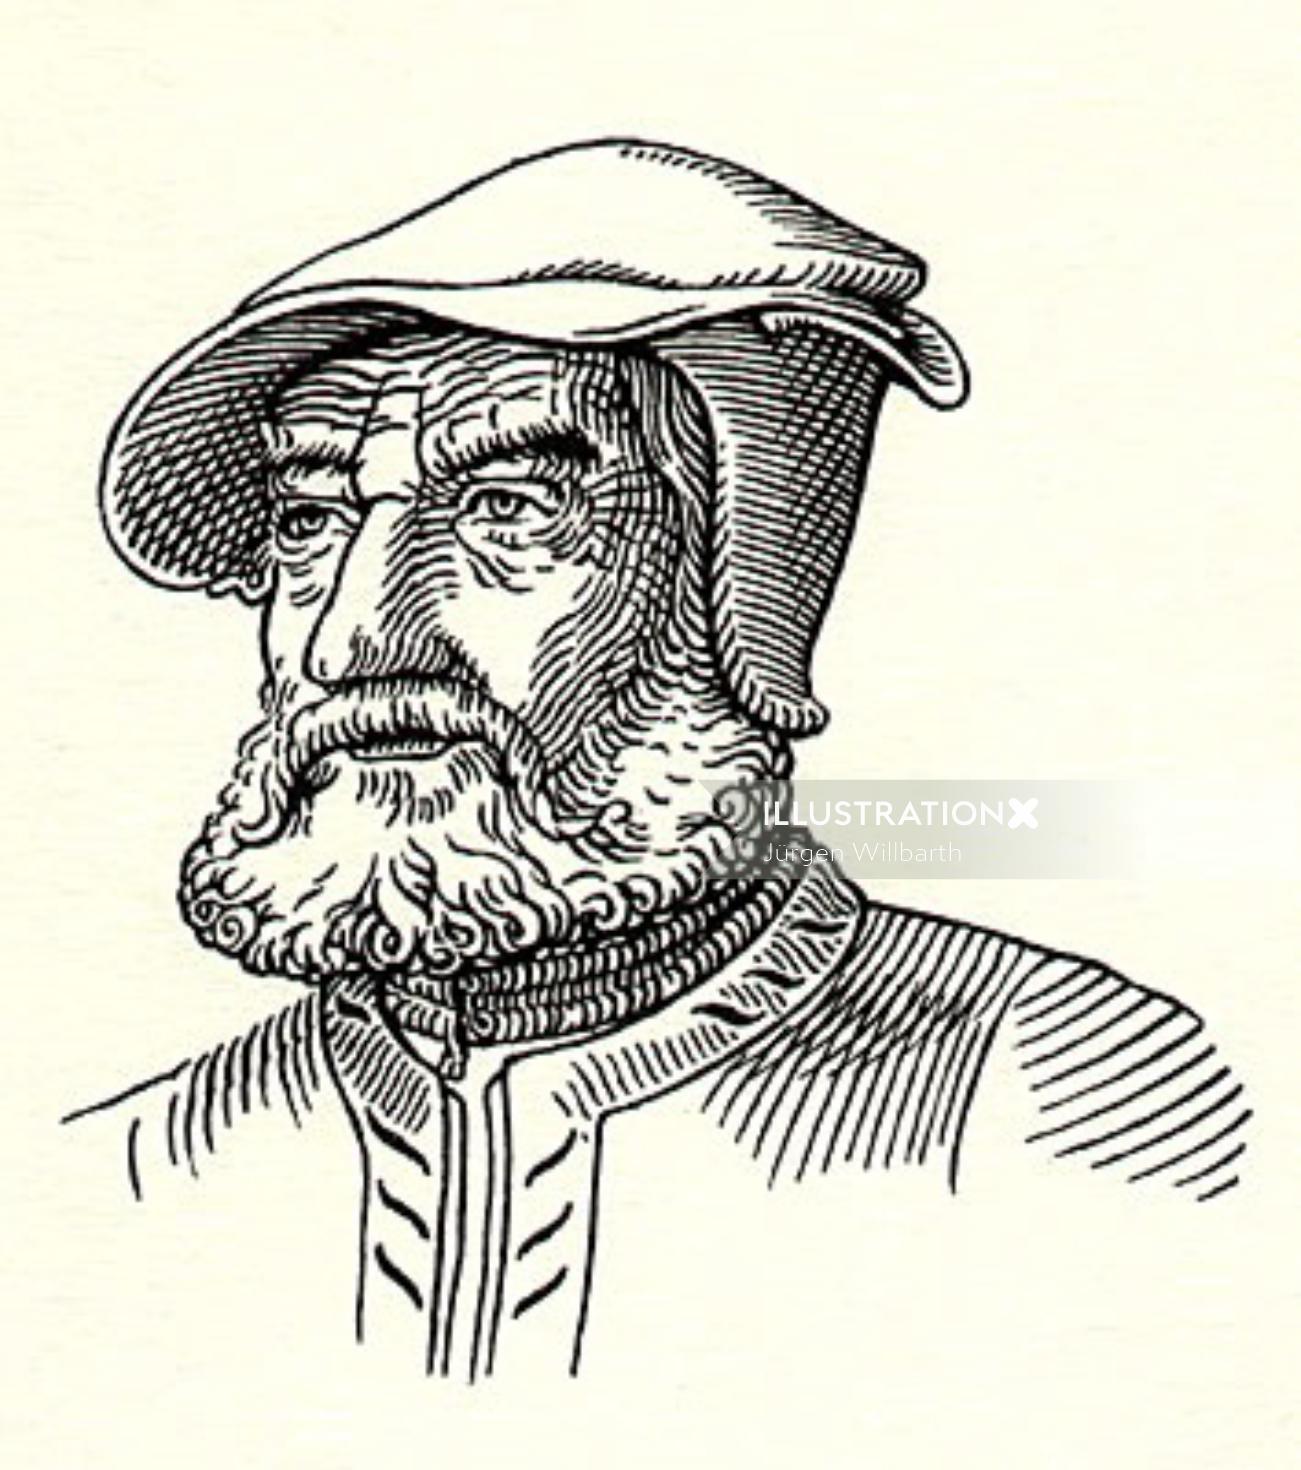 Jürgen Willbarth illustrator - painting illustration